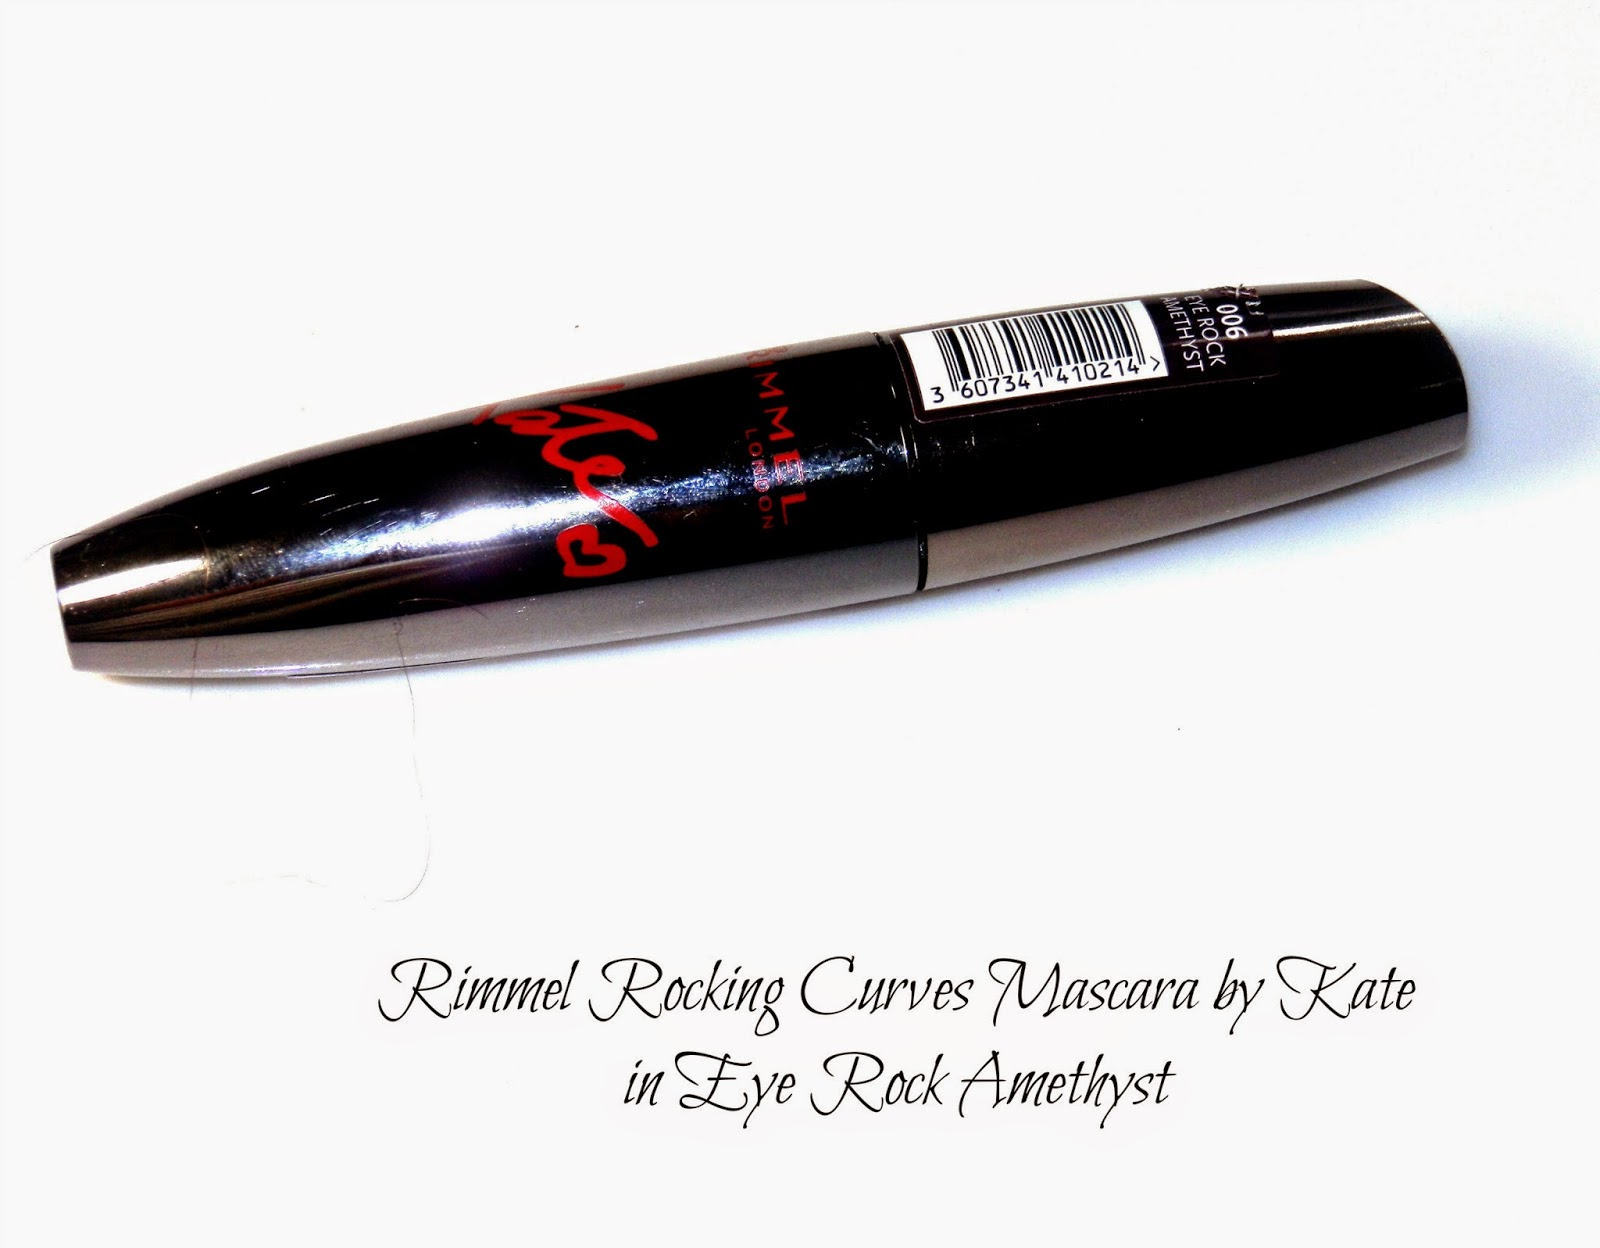 Rimmel Rocking Curves Mascara by Kate in Eye Rock Amethyst